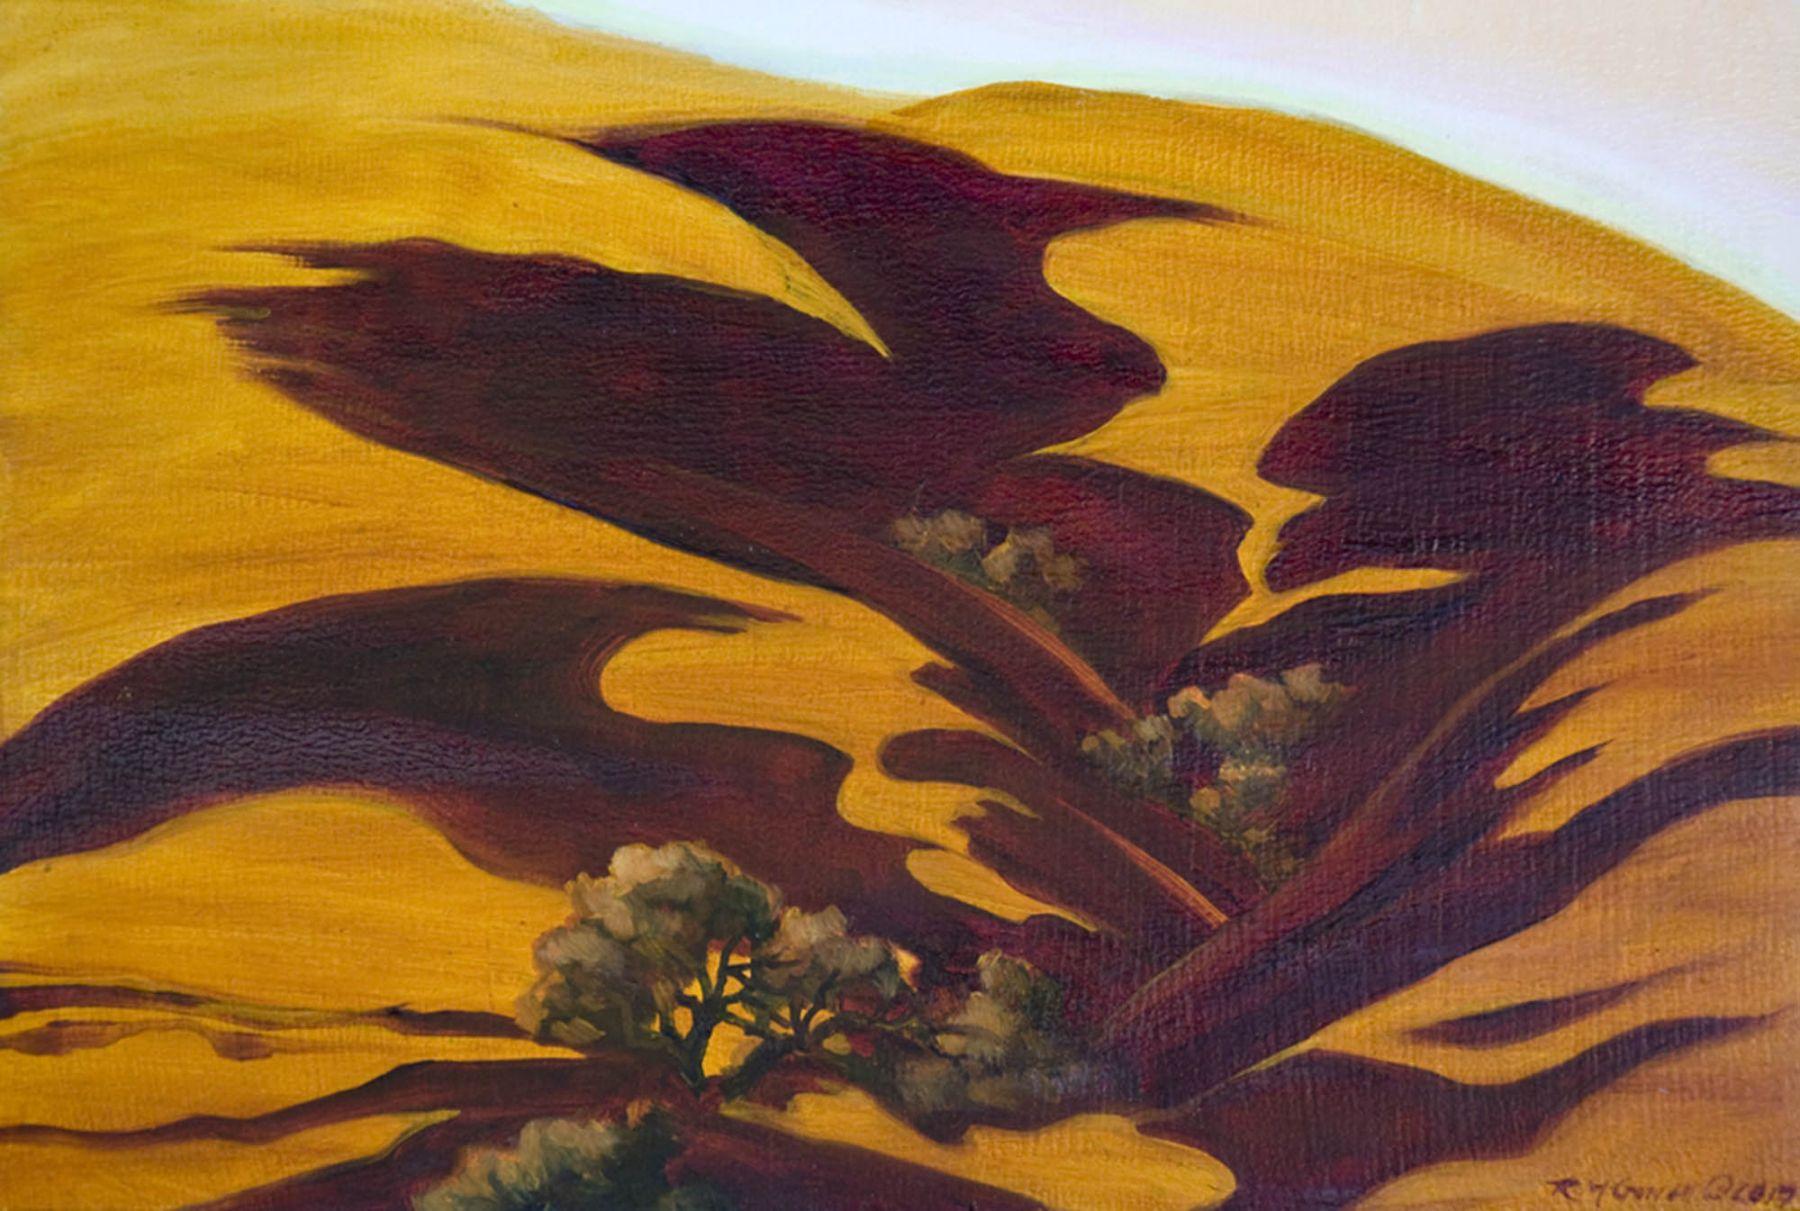 Robin Gowen, Shadows Flow, 2017